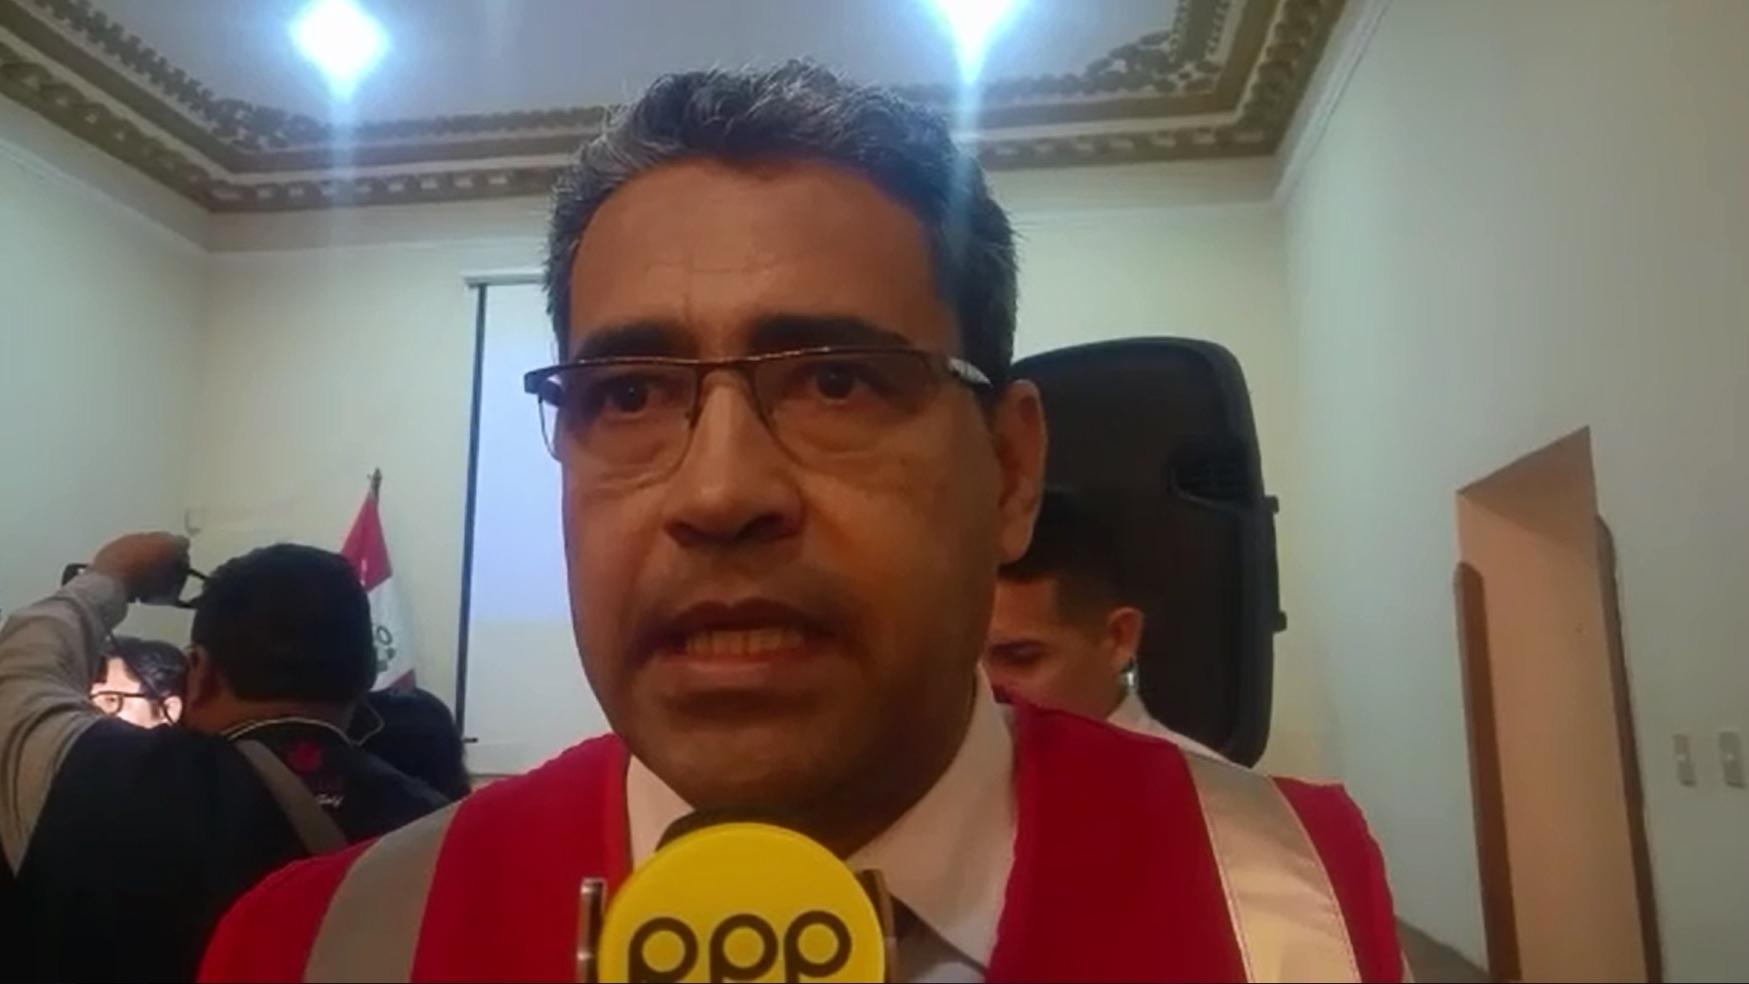 Superintendente regional de la Sunafil en La Libertad, Miguel Rubiños, advirtió un alto porcentaje de choferes que laboran de manera informal.